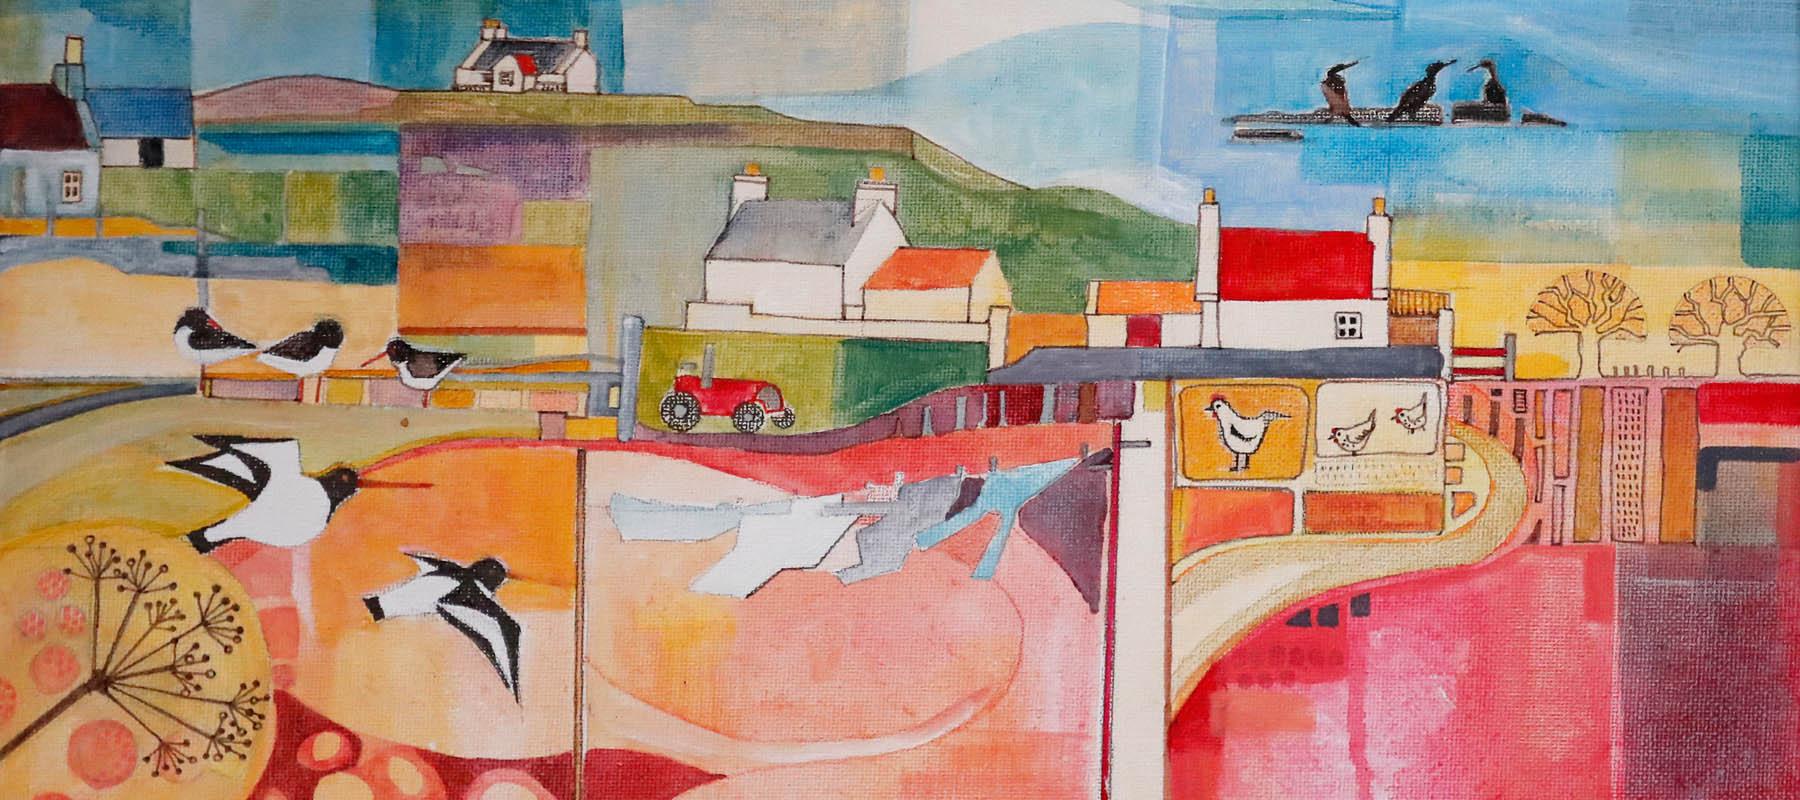 Canvas by - Jane Harlington - artist - Blue Pig Studio - Carloway - Isle of Lewis